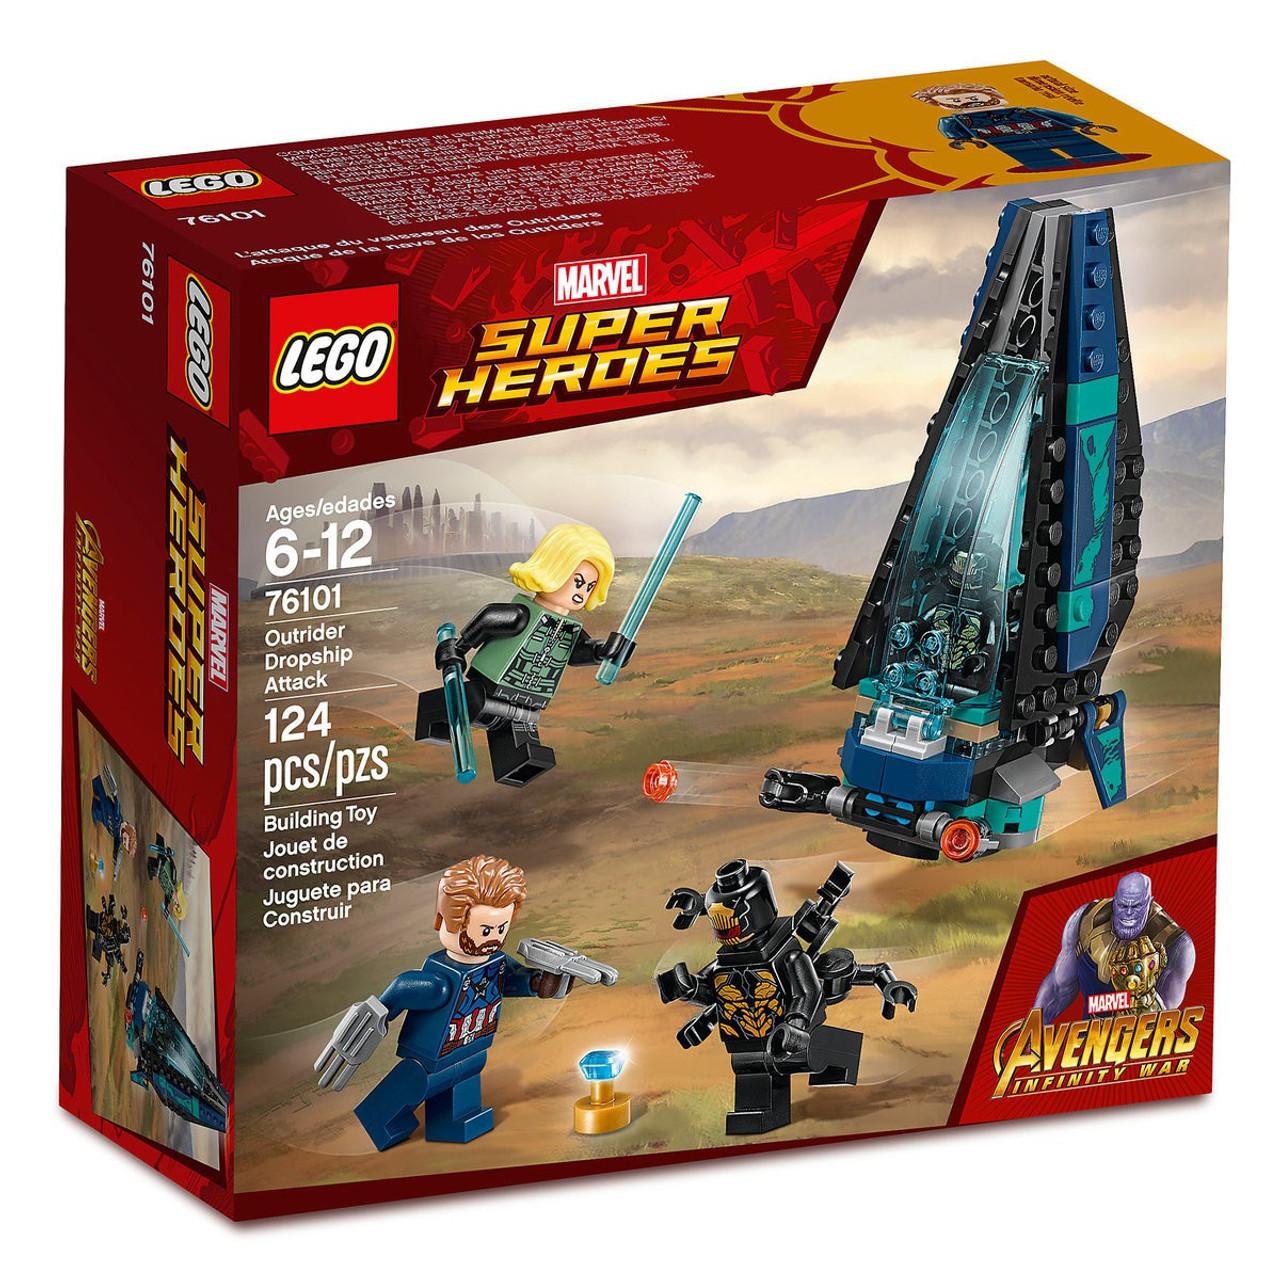 LEGO Marvel Super Heroes Avengers Infinity War The ...